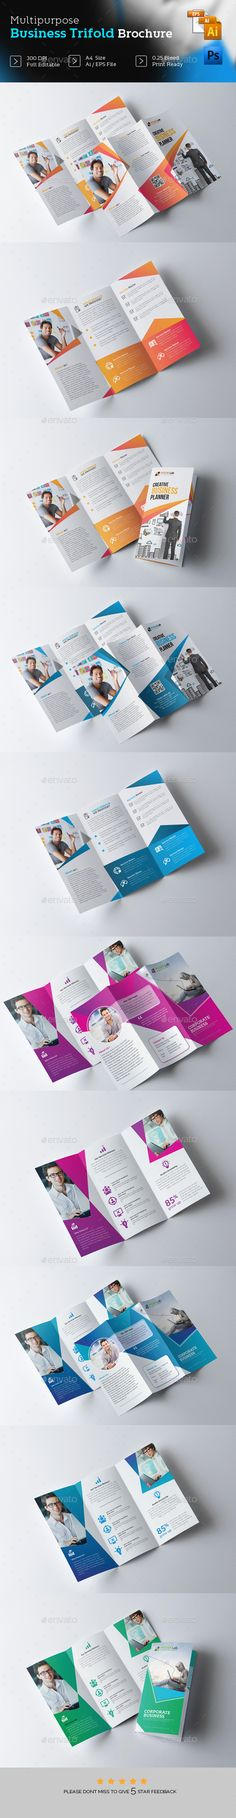 Free PSD Mockups - Trifold Brochure Free stuff Pinterest - free pamphlet design